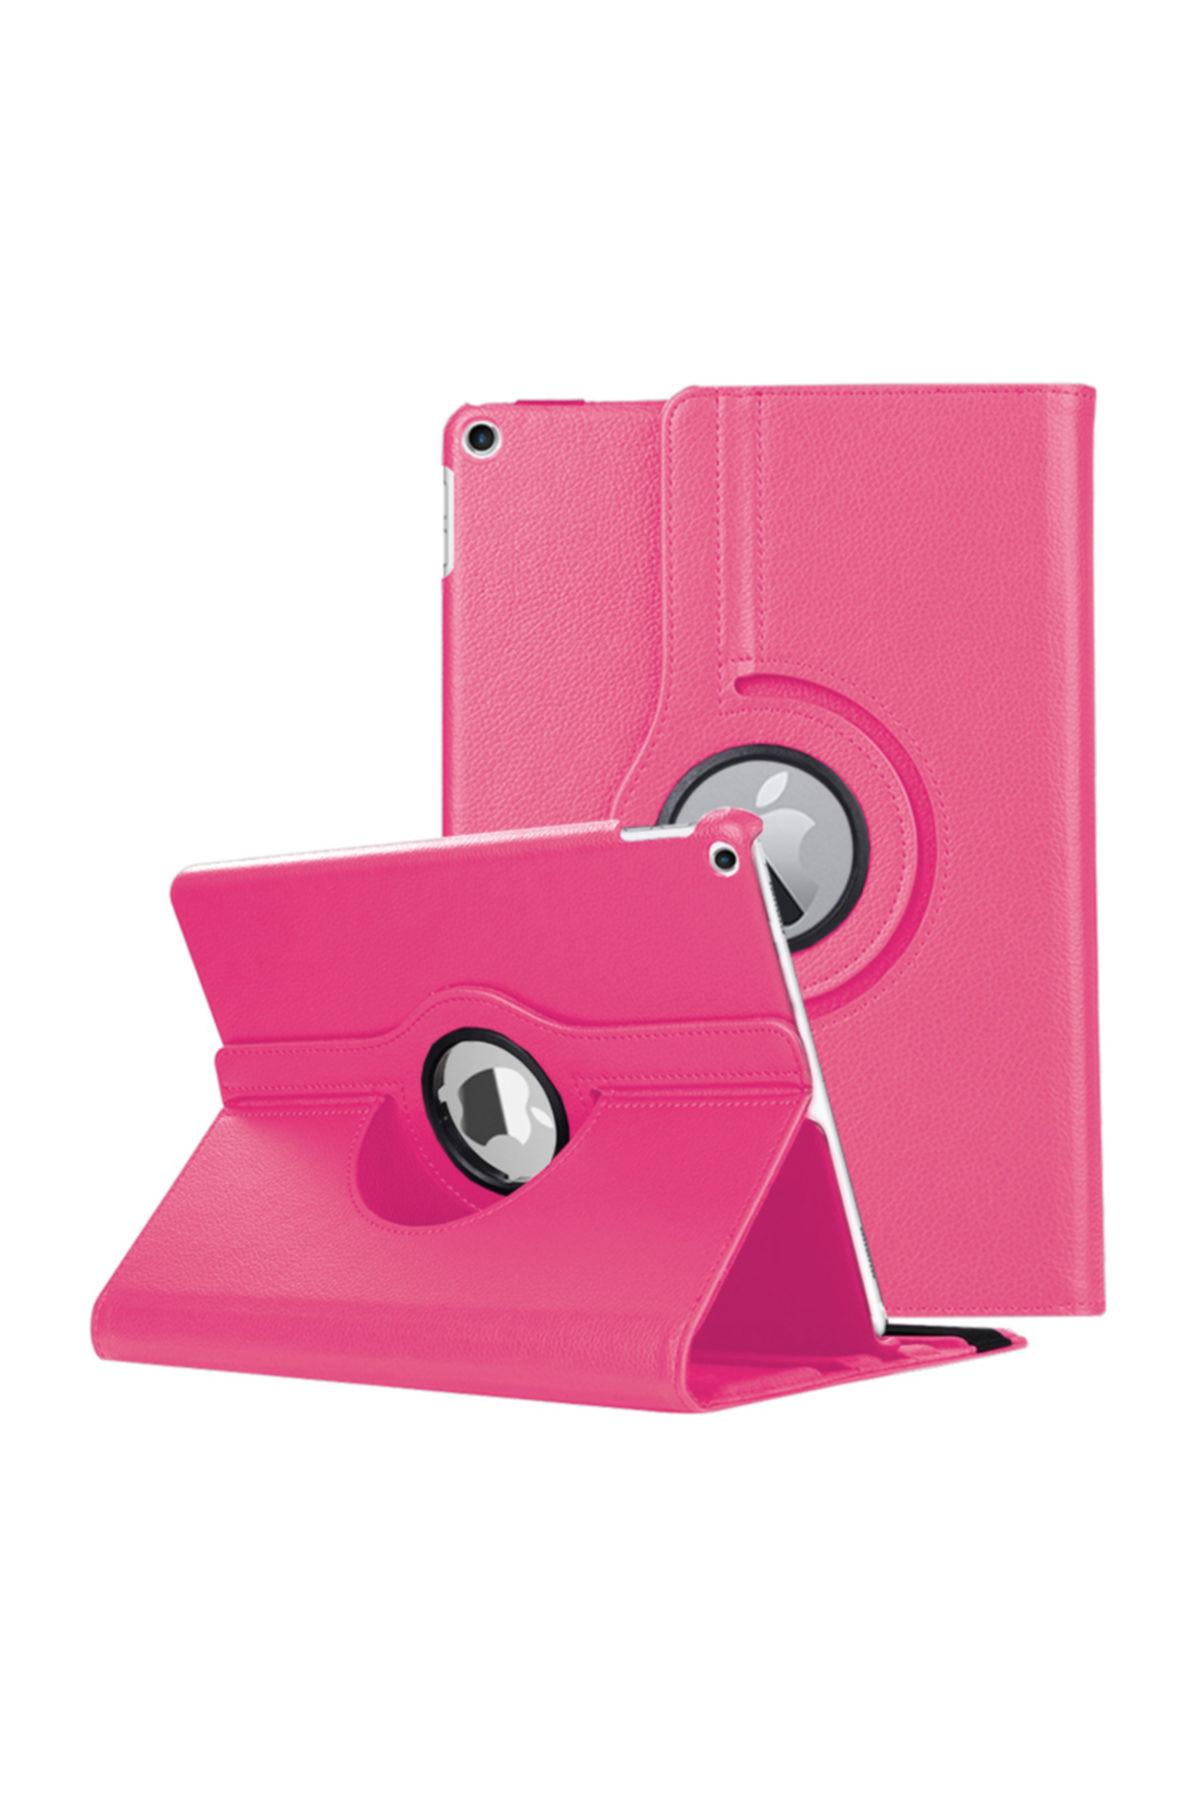 Microsonic Apple iPad Air 3 10.5'' 2019 (A2152-A2123-A2153-A2154) Kılıf 360 Rotating Stand Deri Koyu Pembe 1